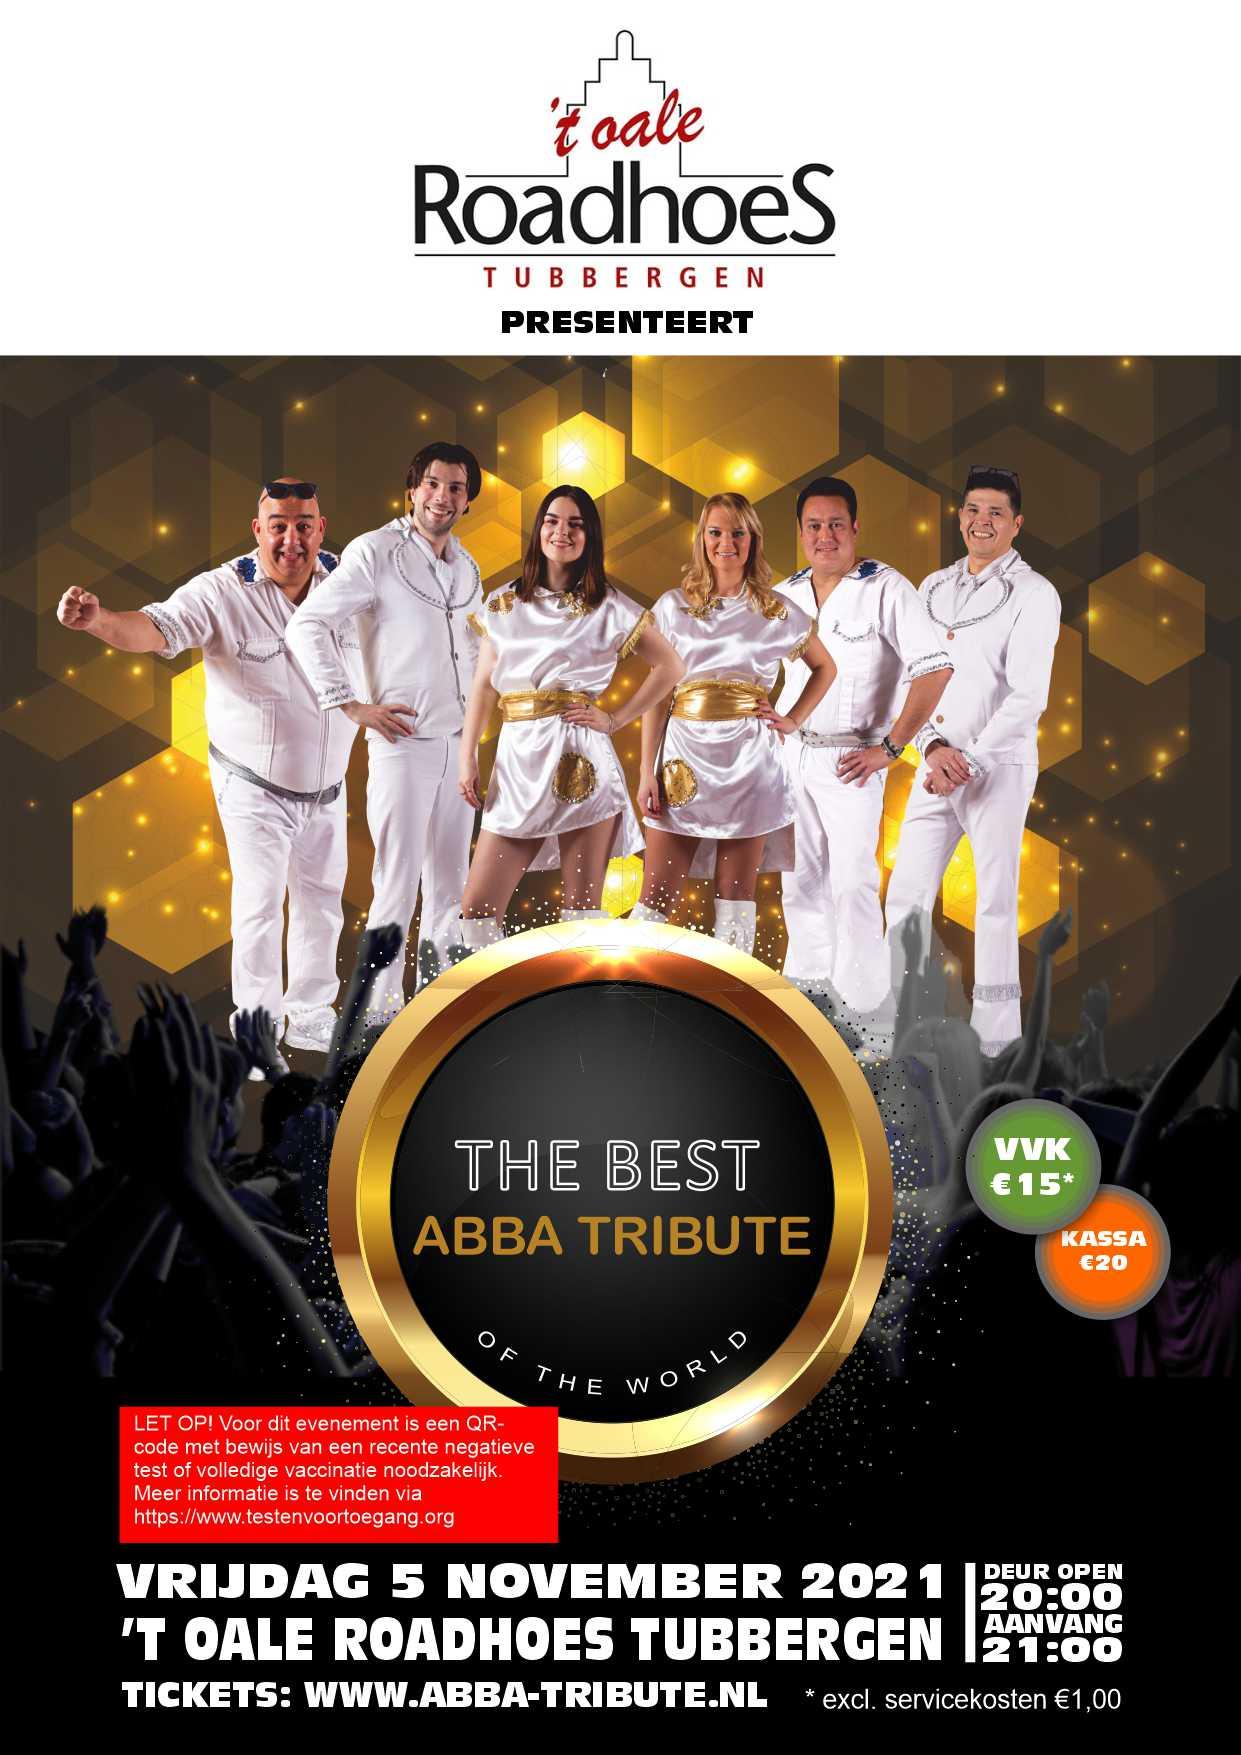 ABBA Tribute 't Oale Roadhoes Tubbergen 2021